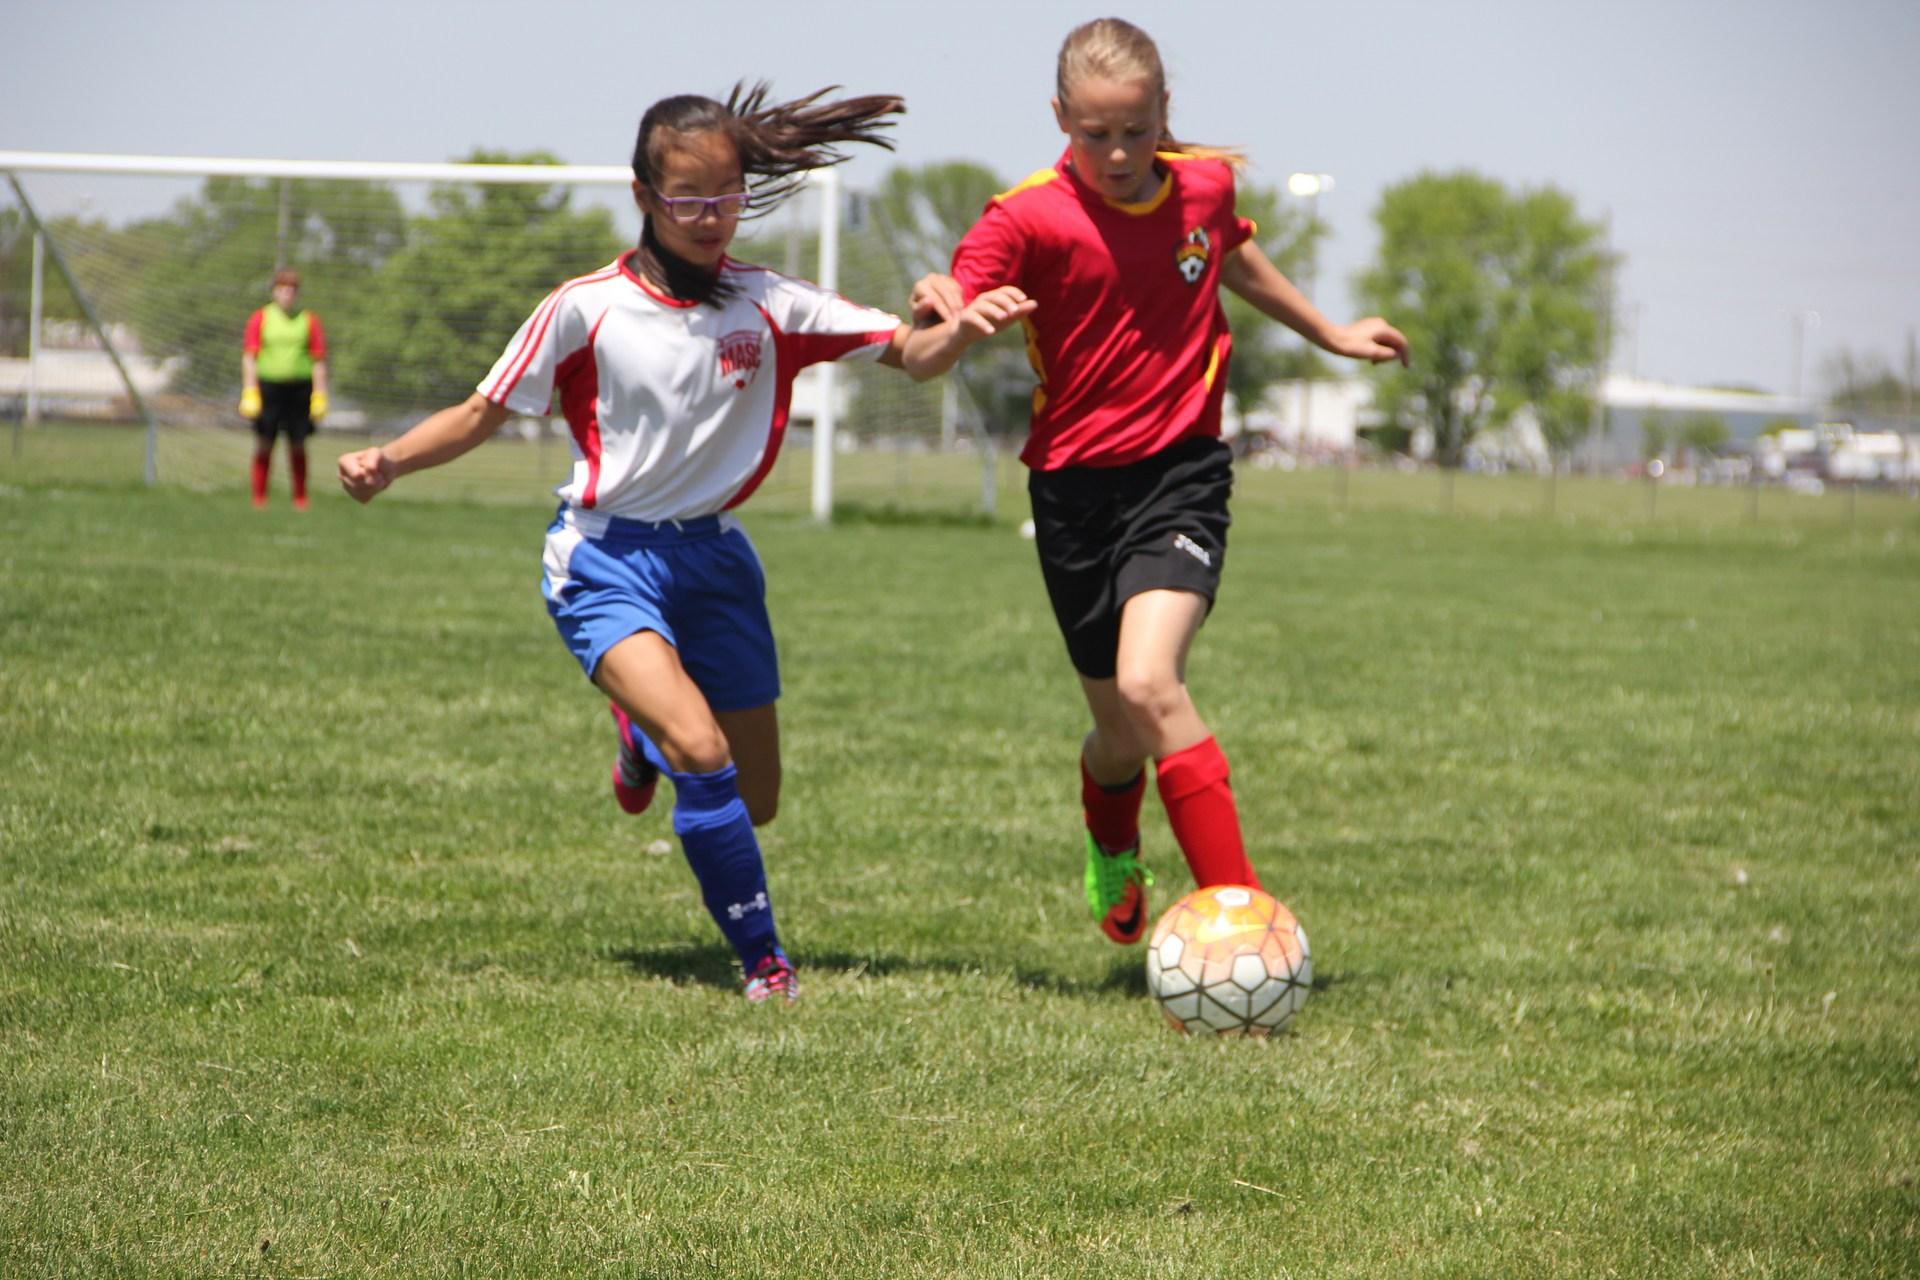 Riley playing soccer